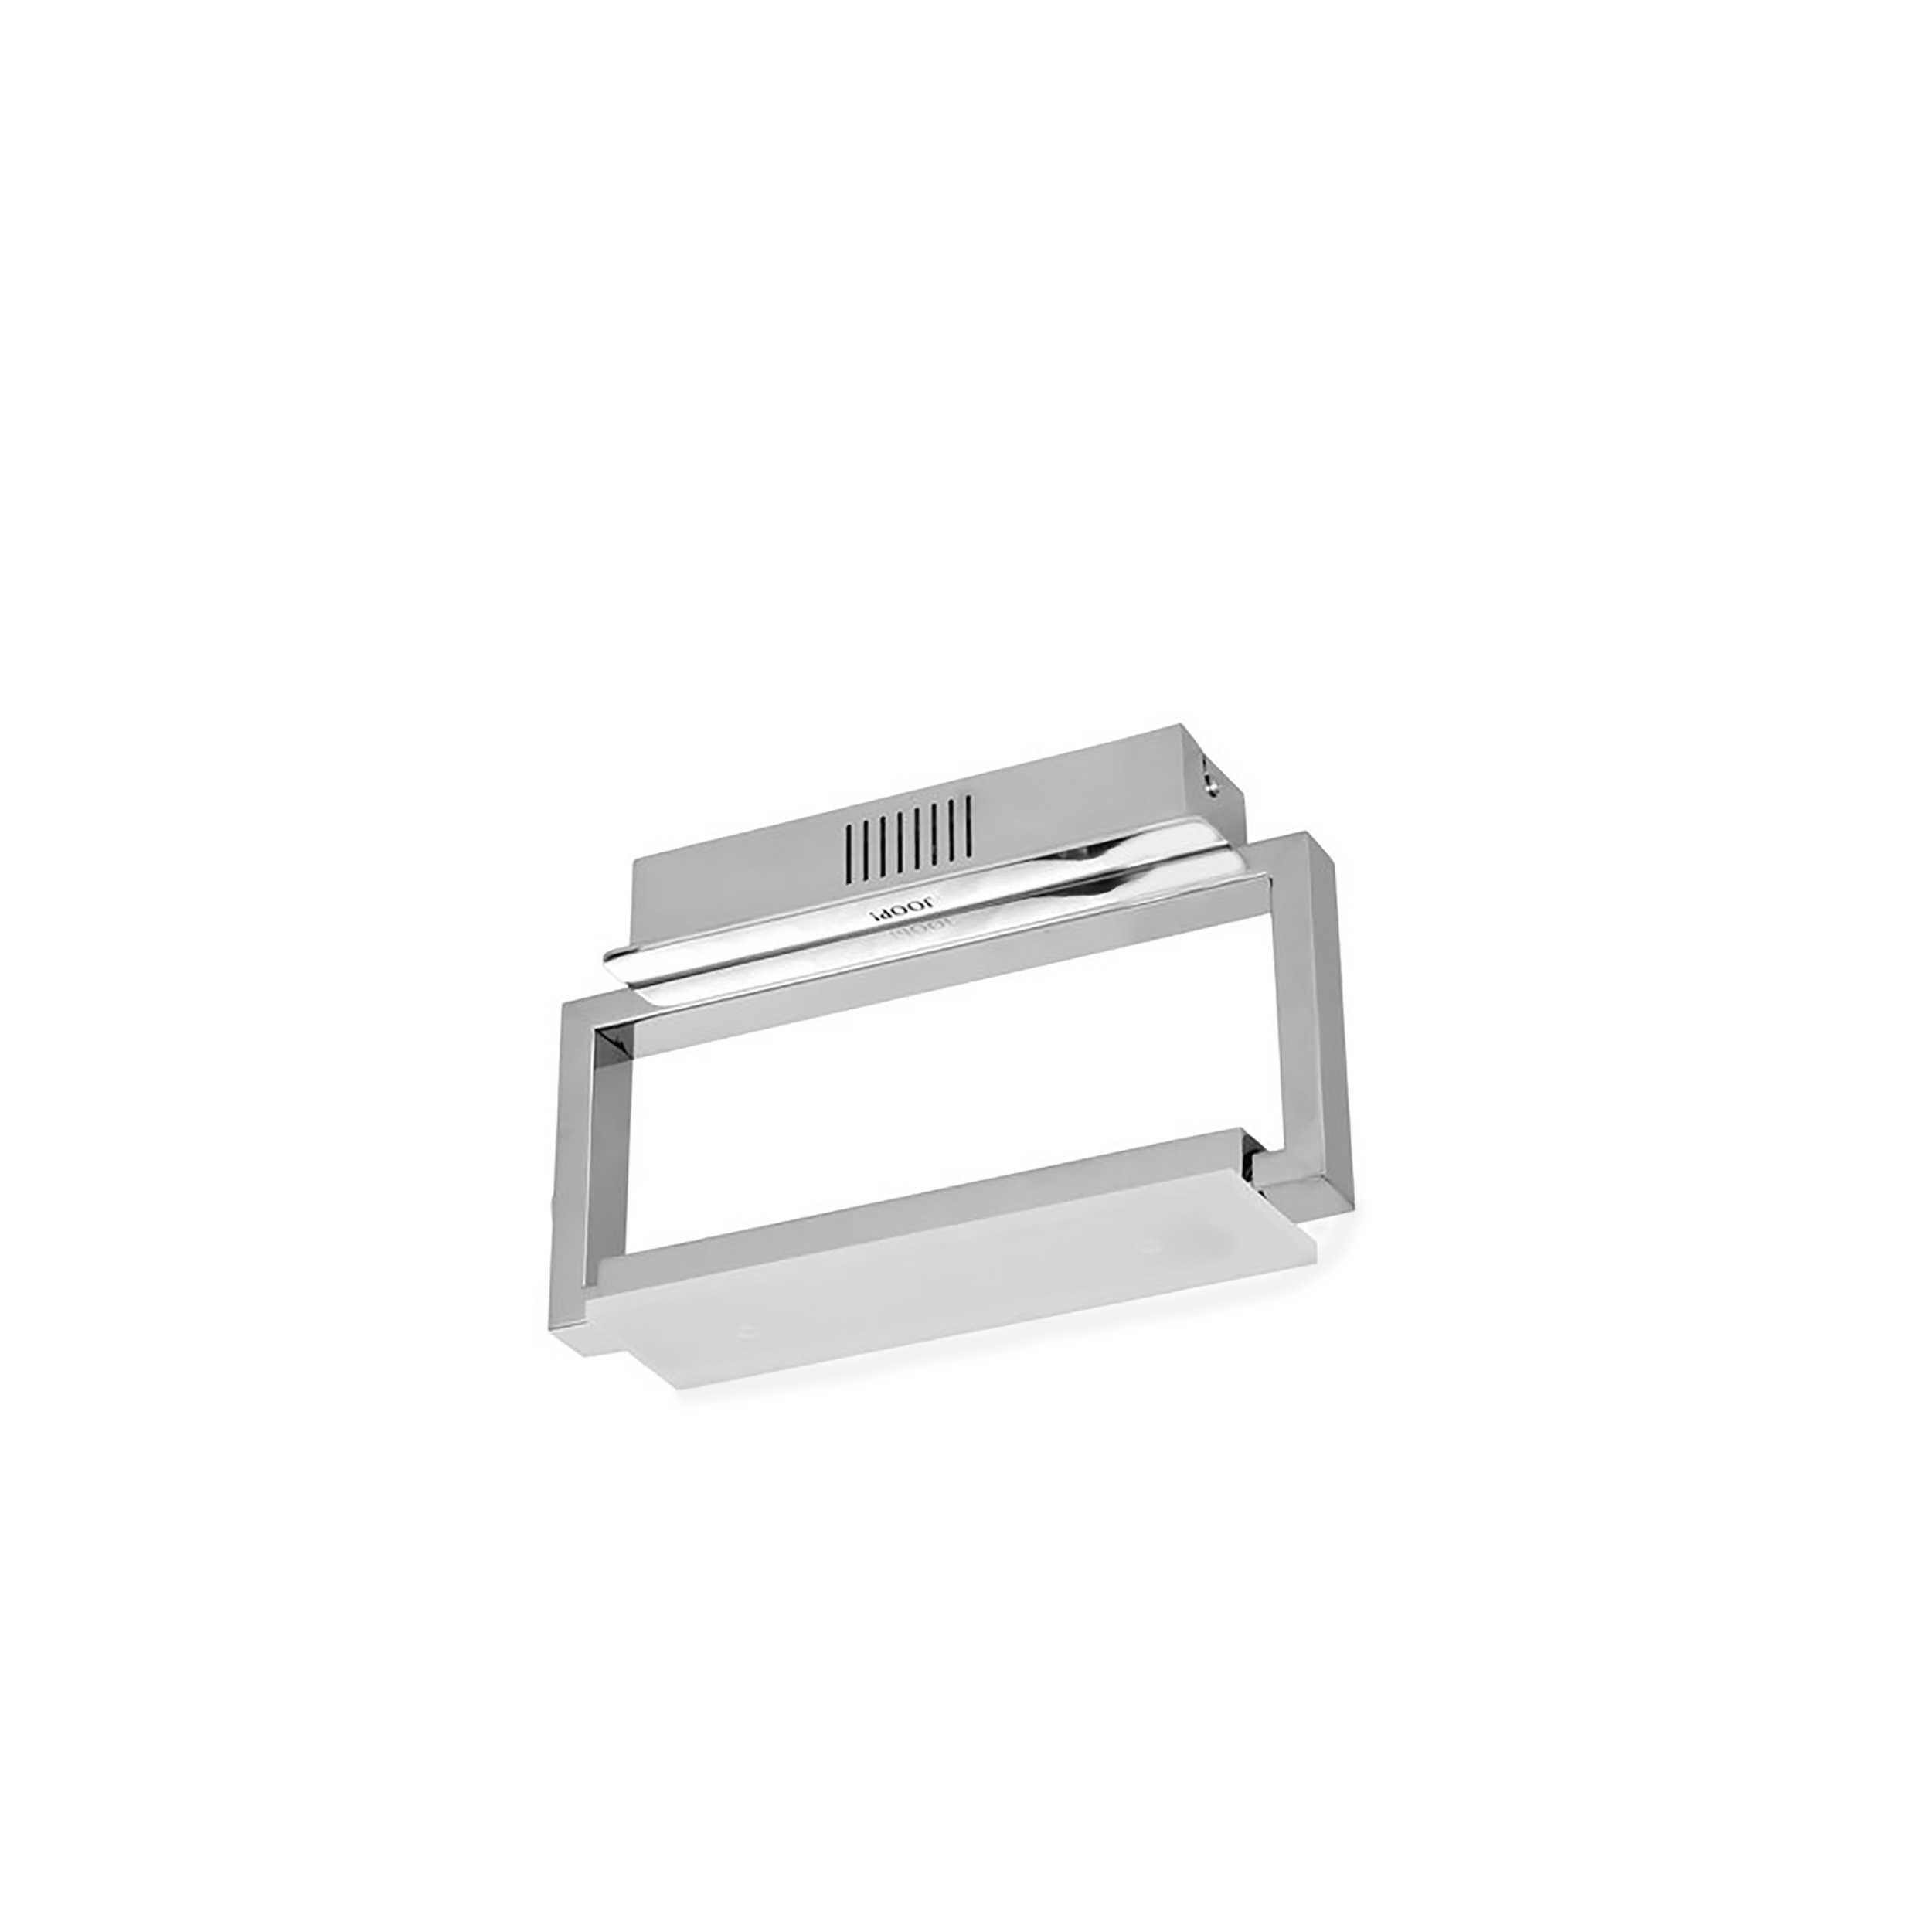 joop led wandleuchte cubic a chrom alu eisen stahl metall online kaufen bei woonio. Black Bedroom Furniture Sets. Home Design Ideas